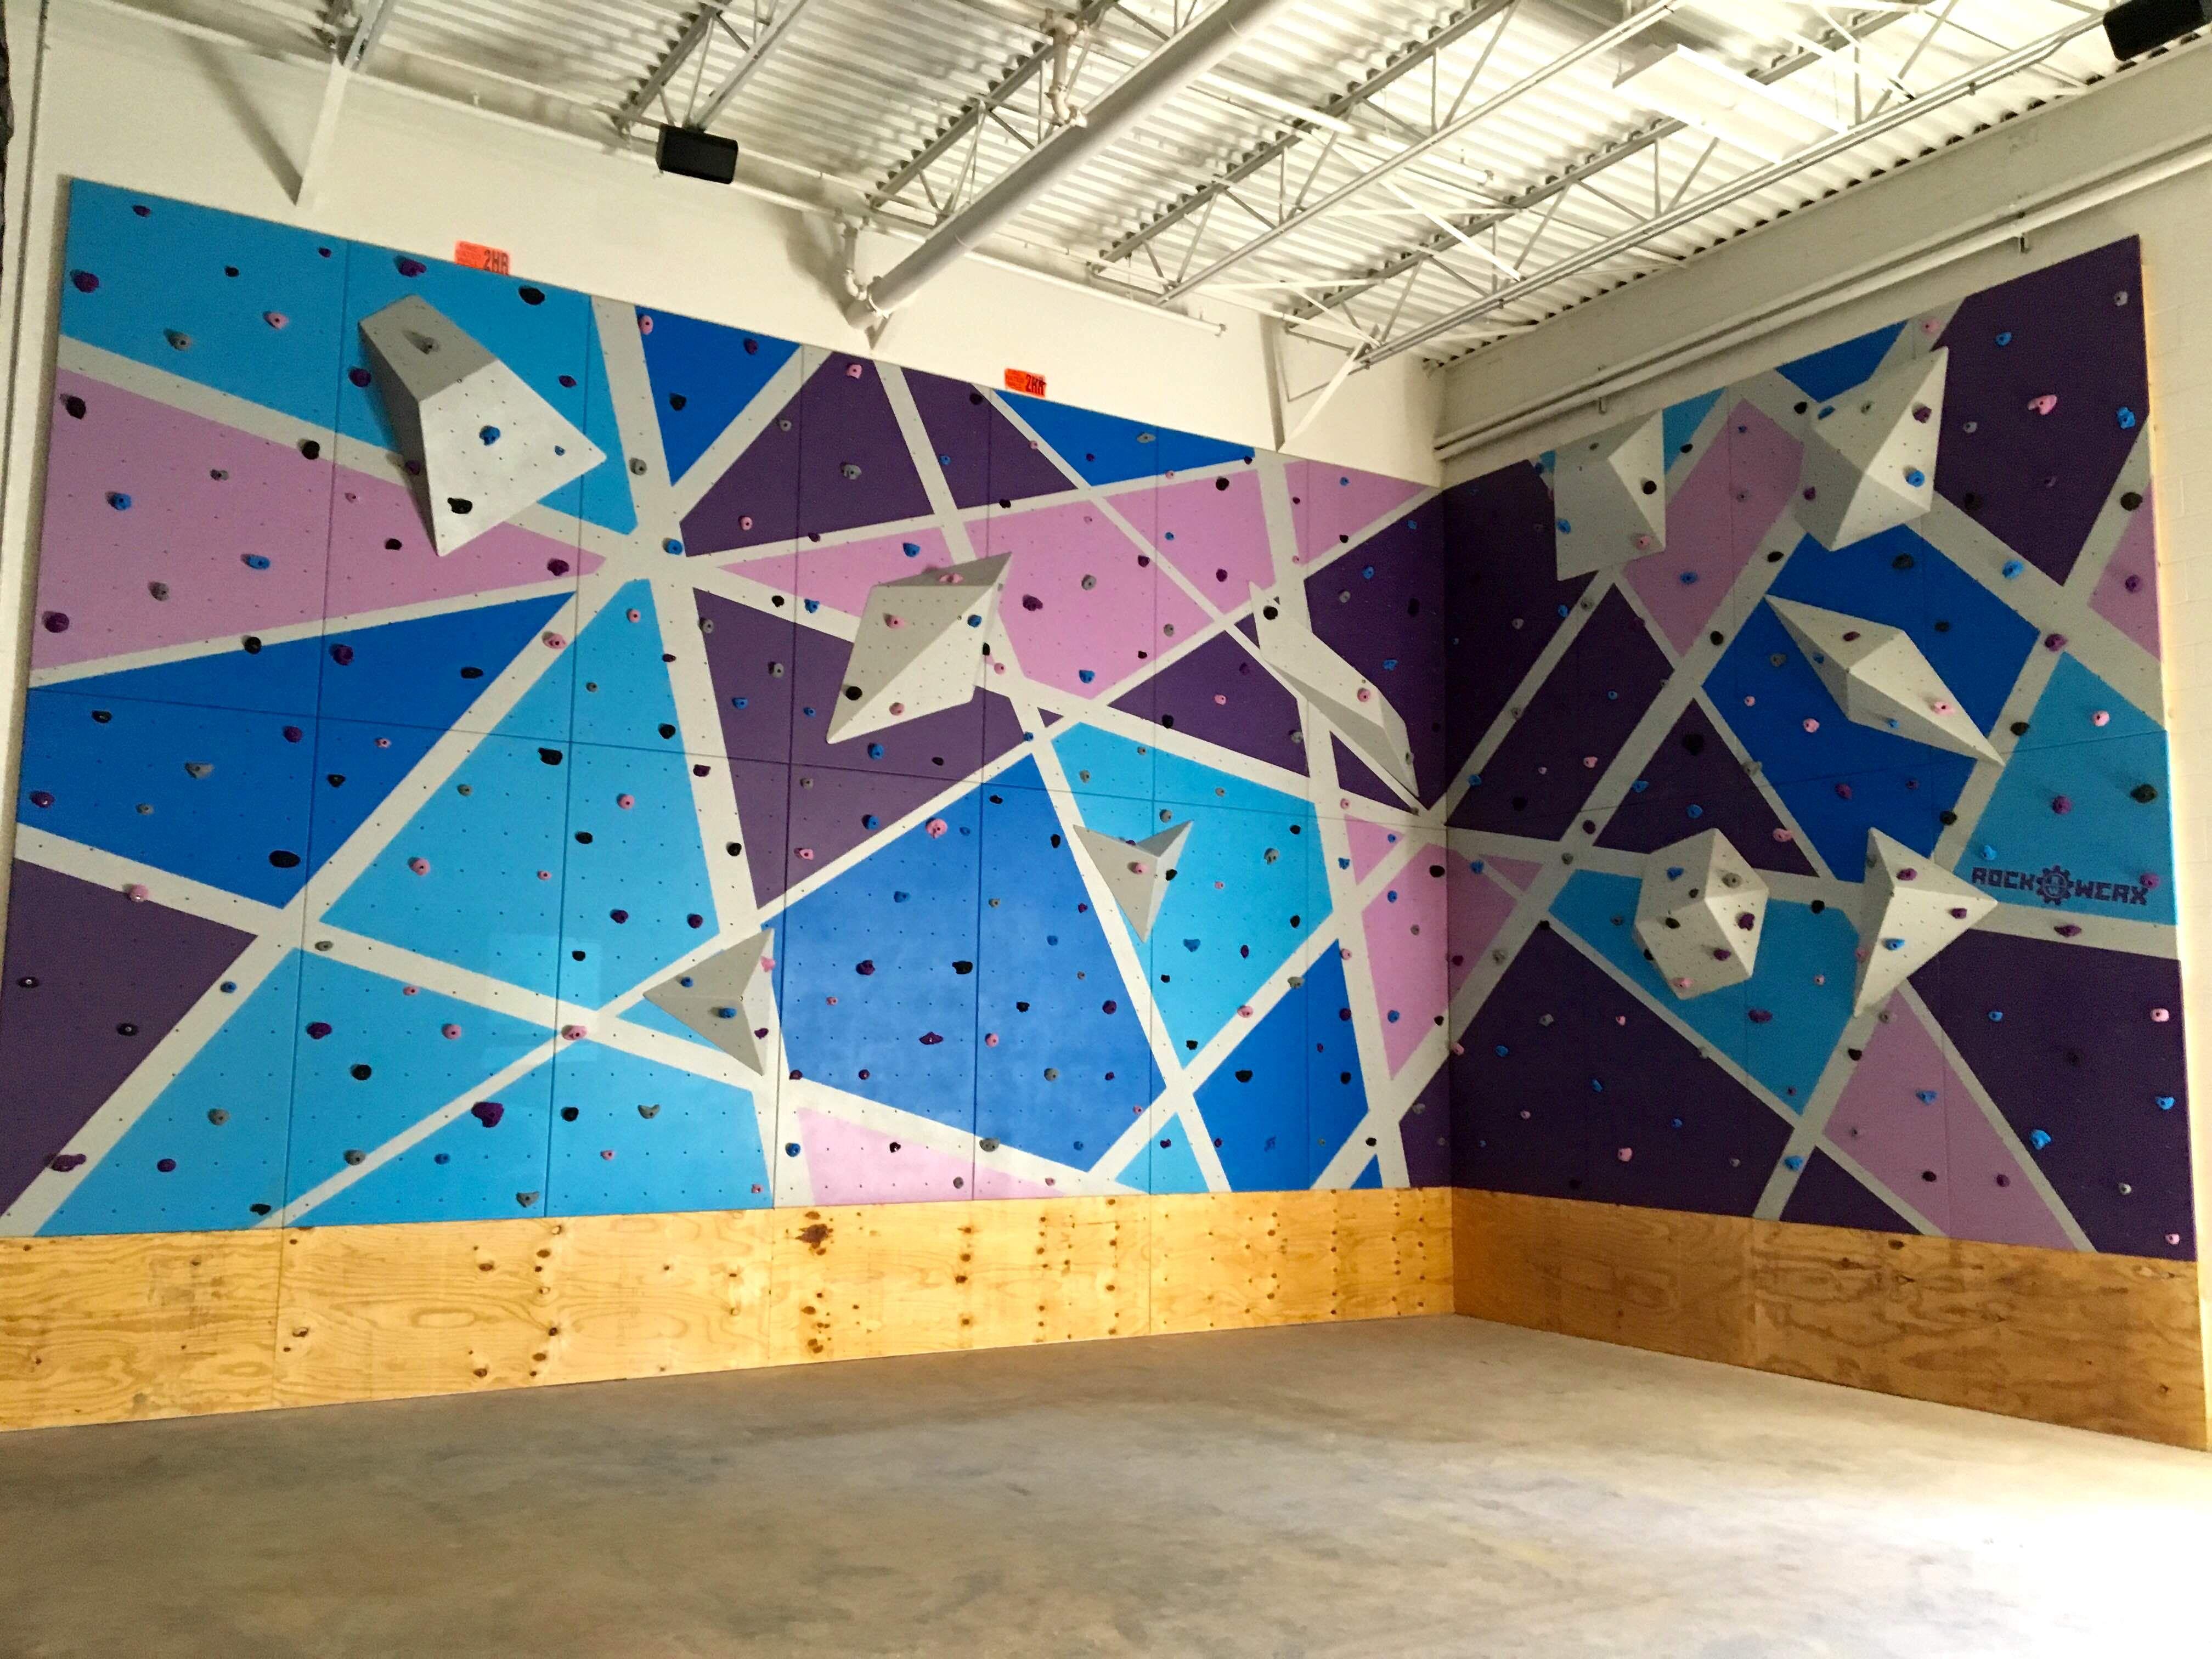 Rockwerx Gym Rock Lite Modular Panels Altitude Fitness In Tampa Fl Climb Climbstronger Custom Rock Climbing Wall Climbing Wall Wall